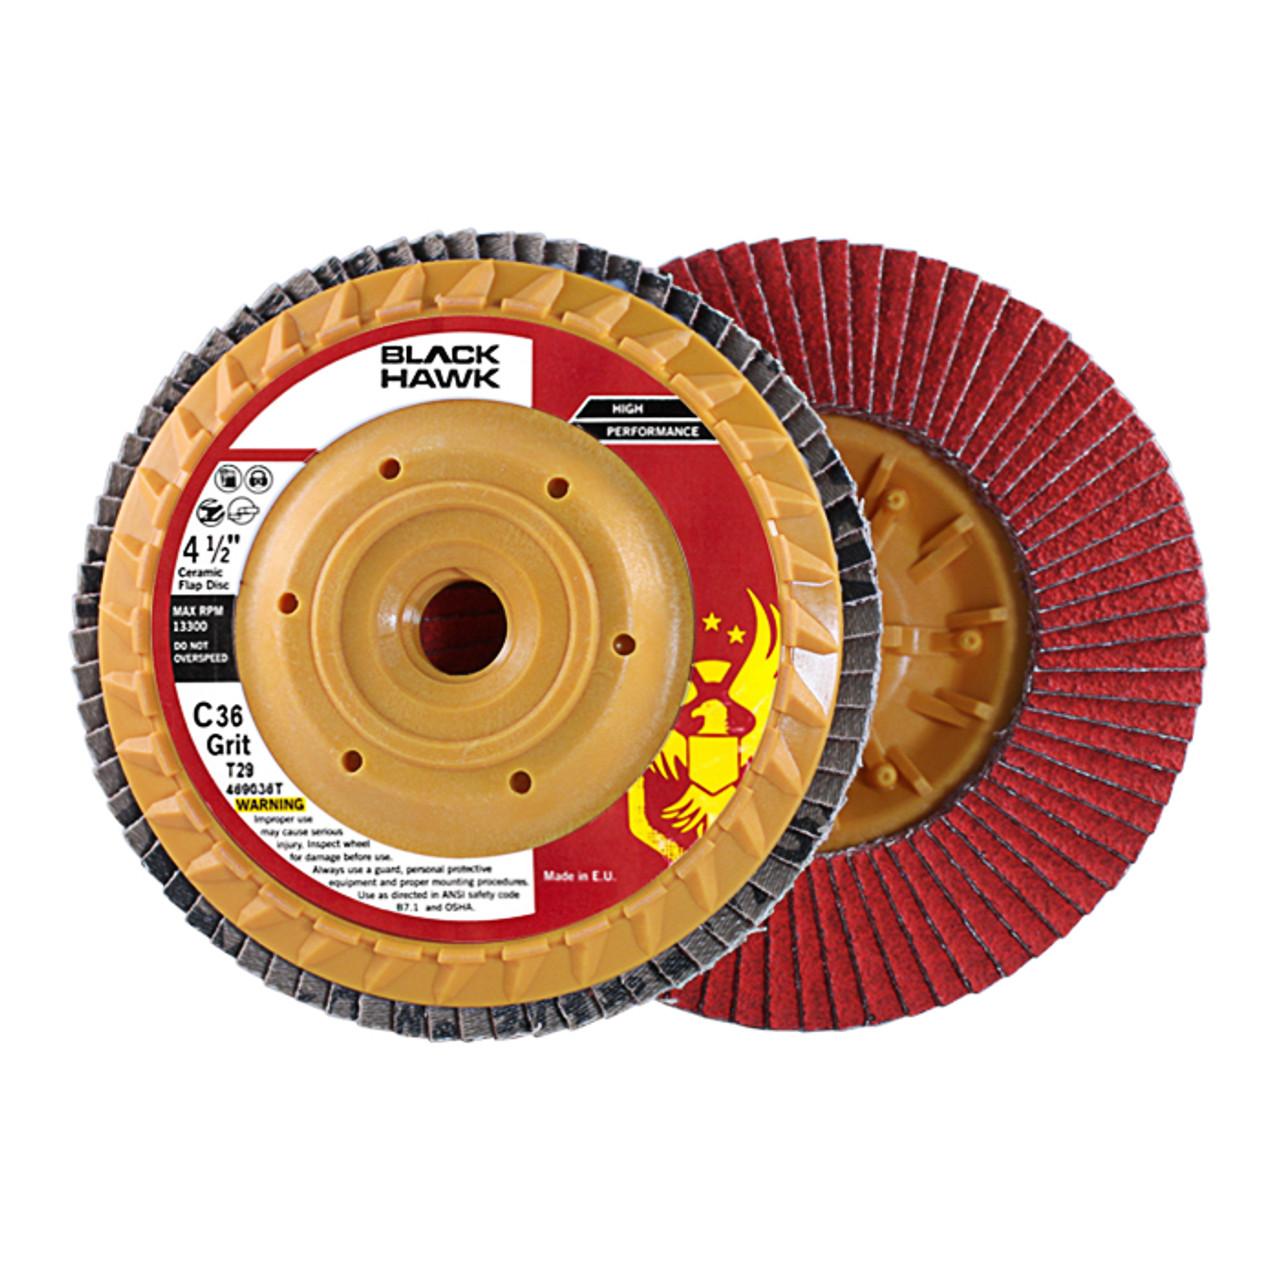 "50 Pack 4.5/"" x 7//8/"" Black Hawk 120 Grit Zirconia Flap Disc Grinding Wheels T29"